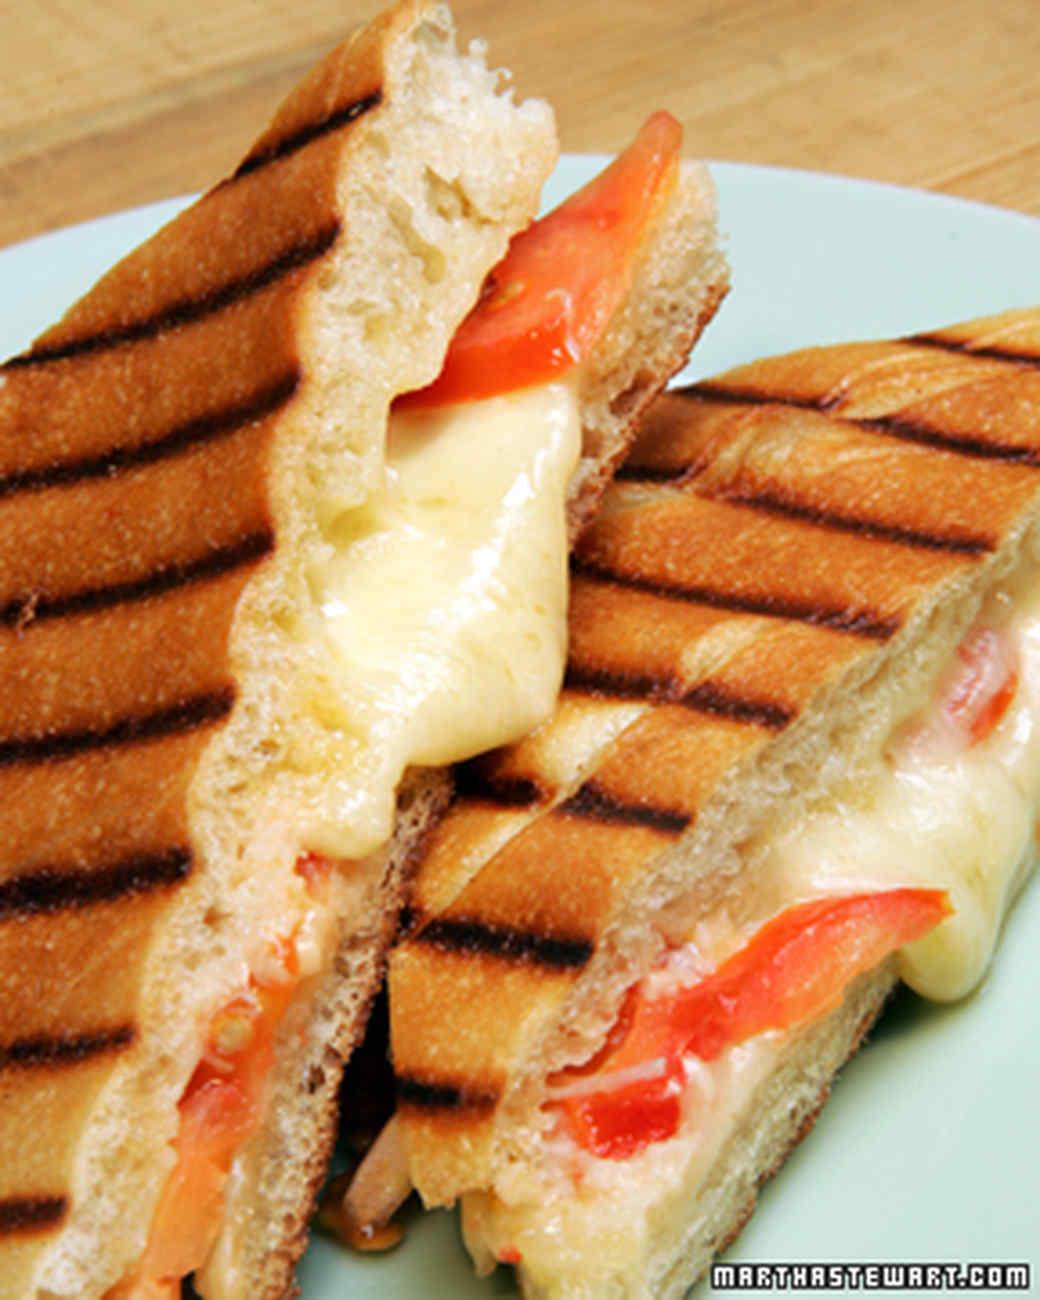 1047_recipe_grilledcheese.jpg